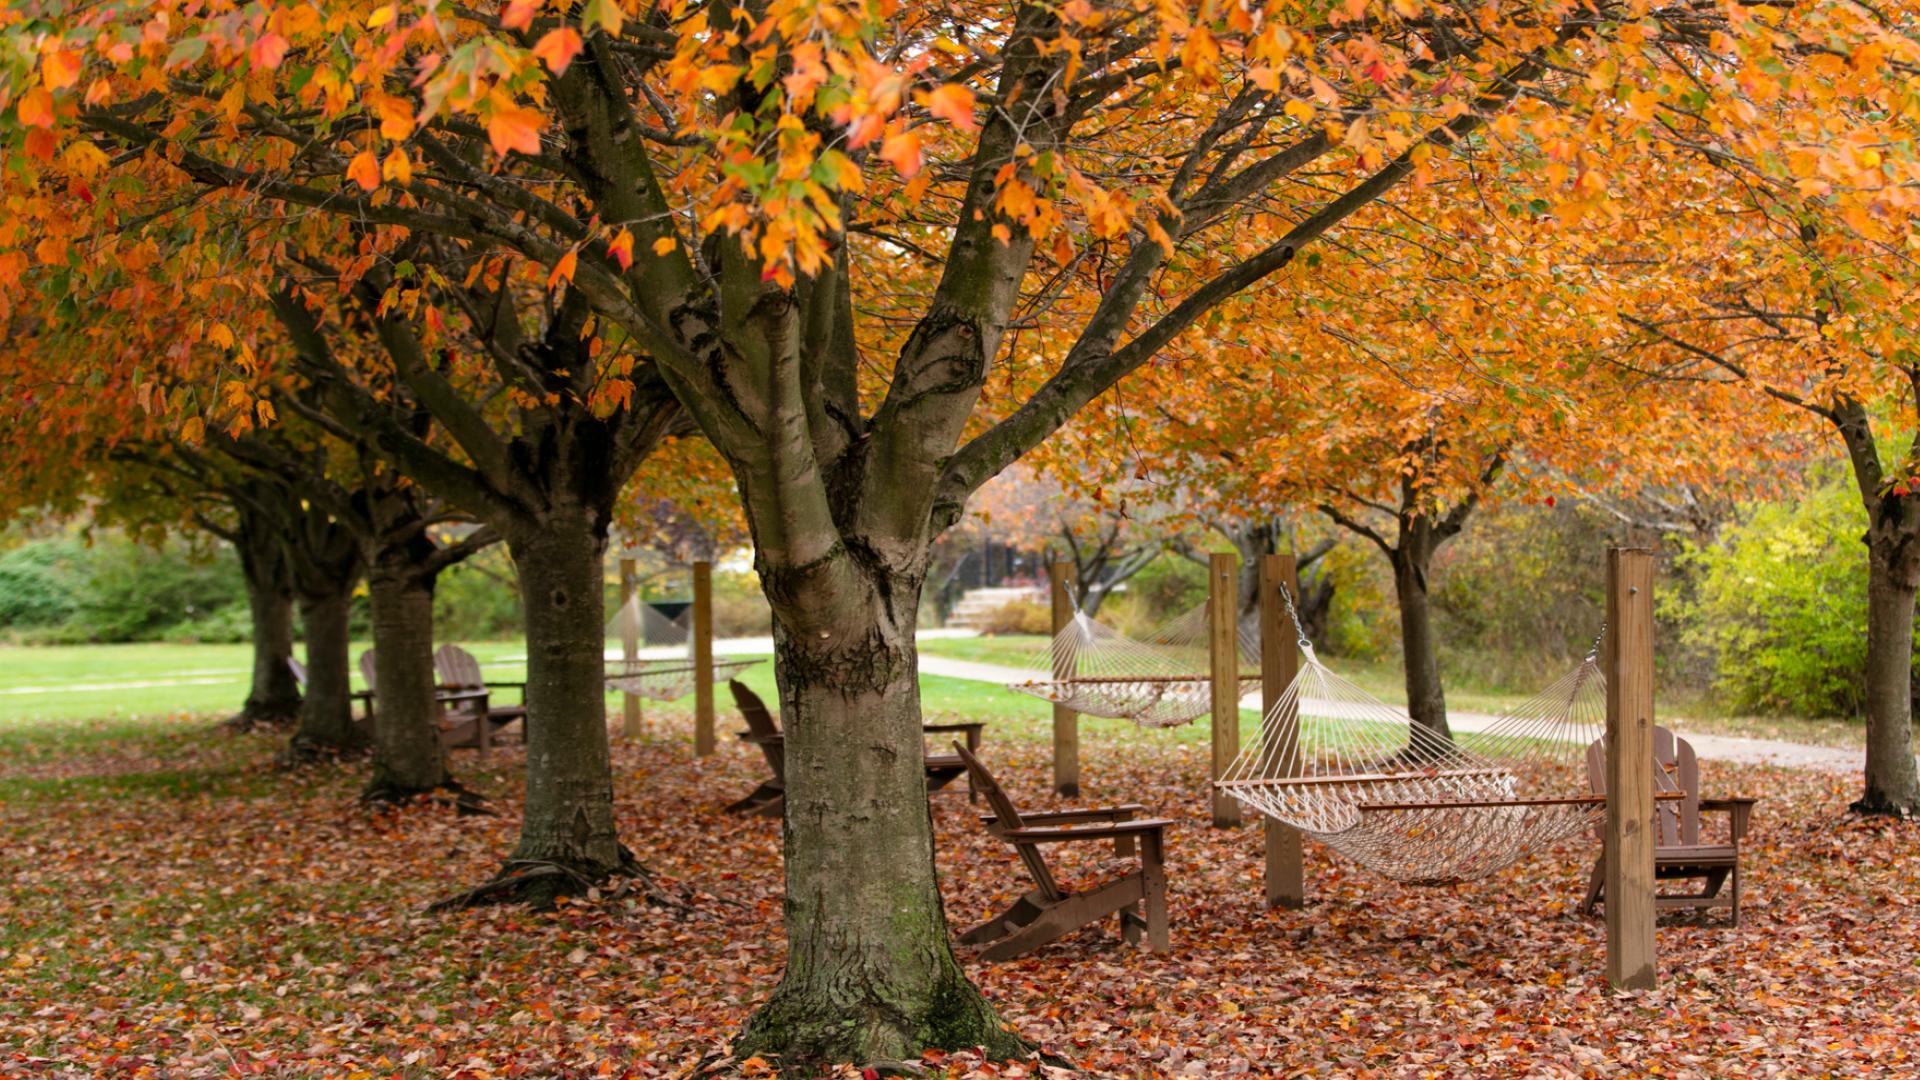 Hammock on campus in fall